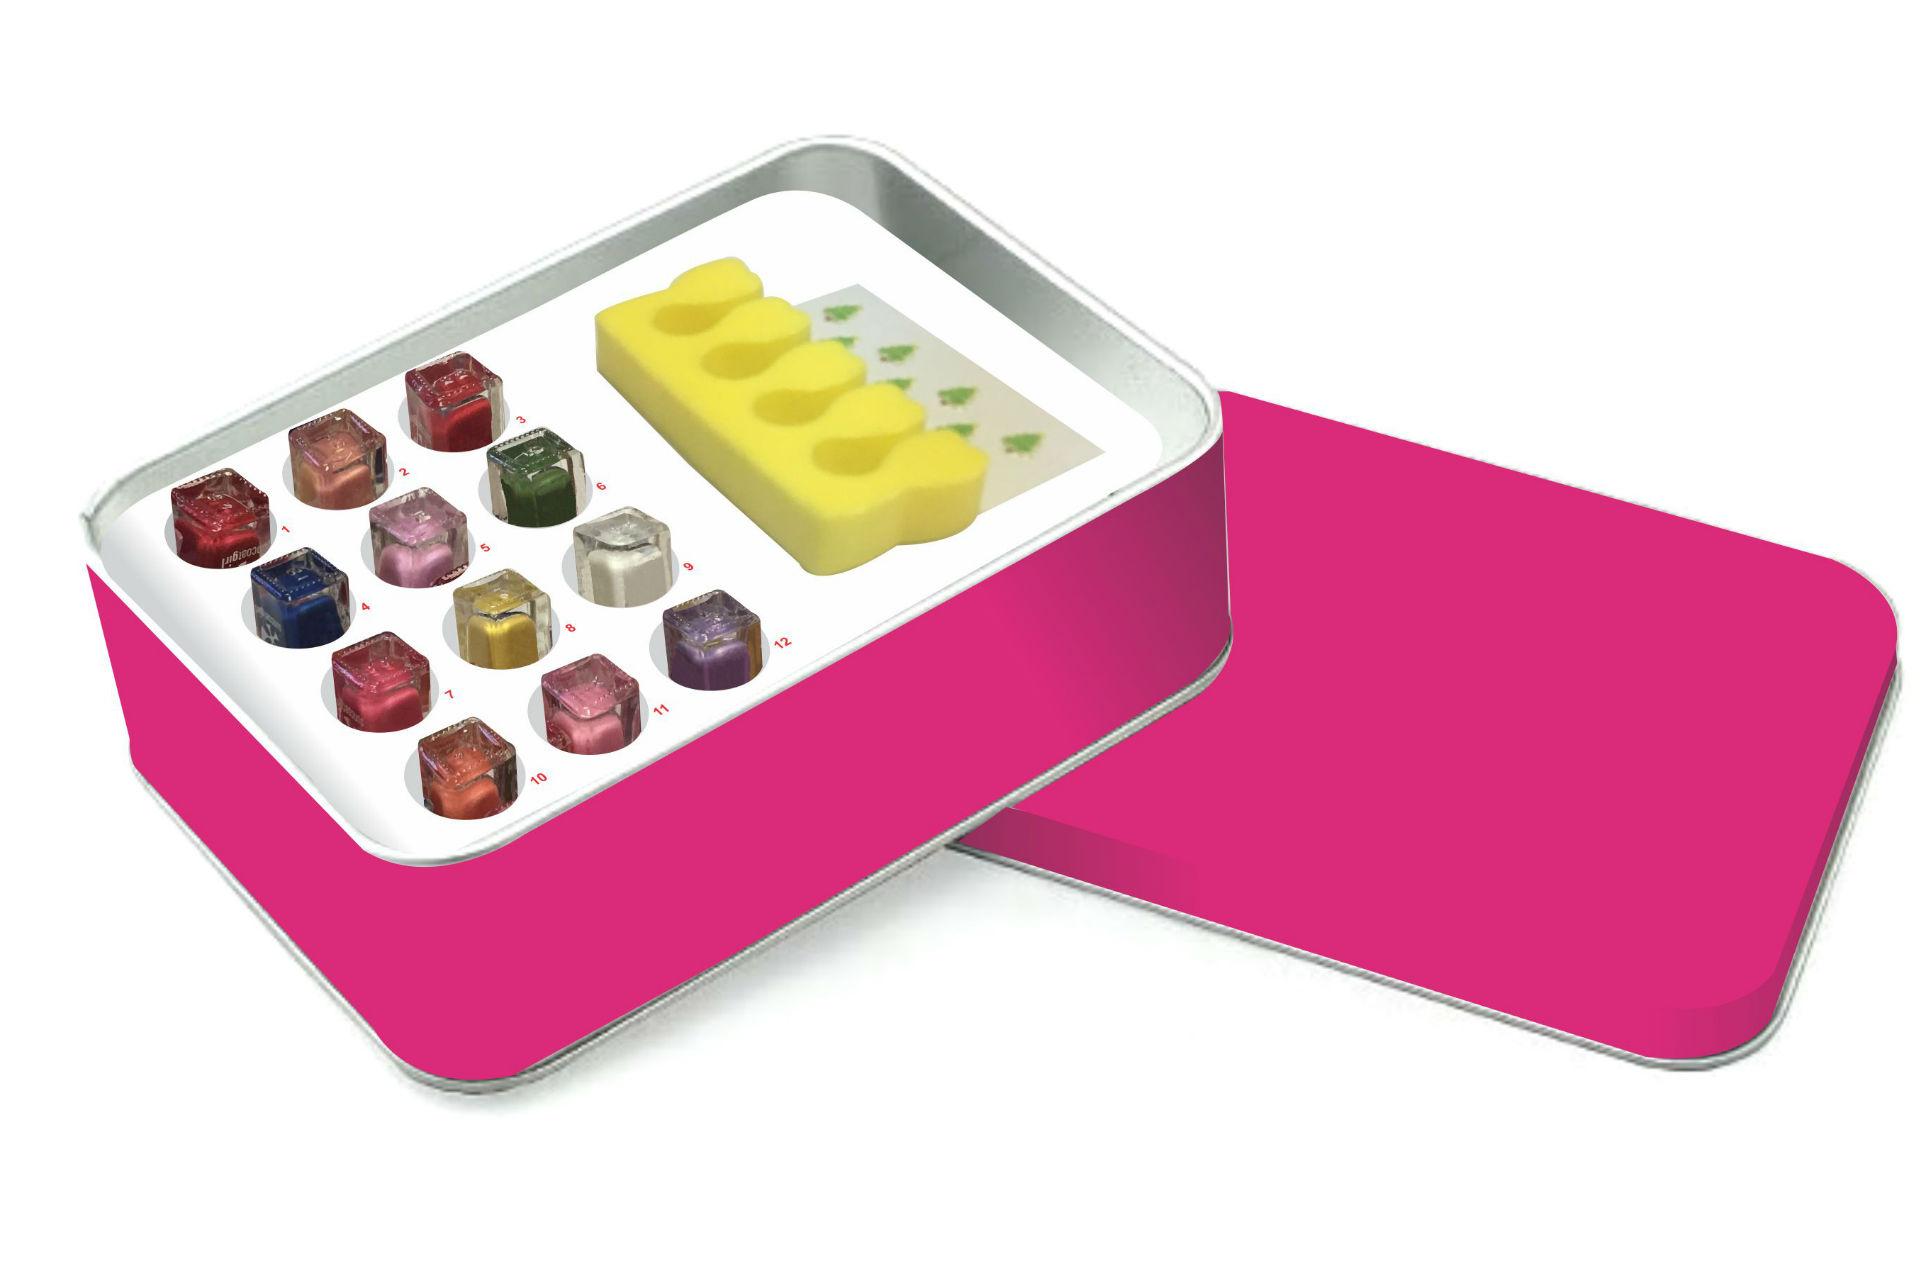 12 Days of Christmas nail kit